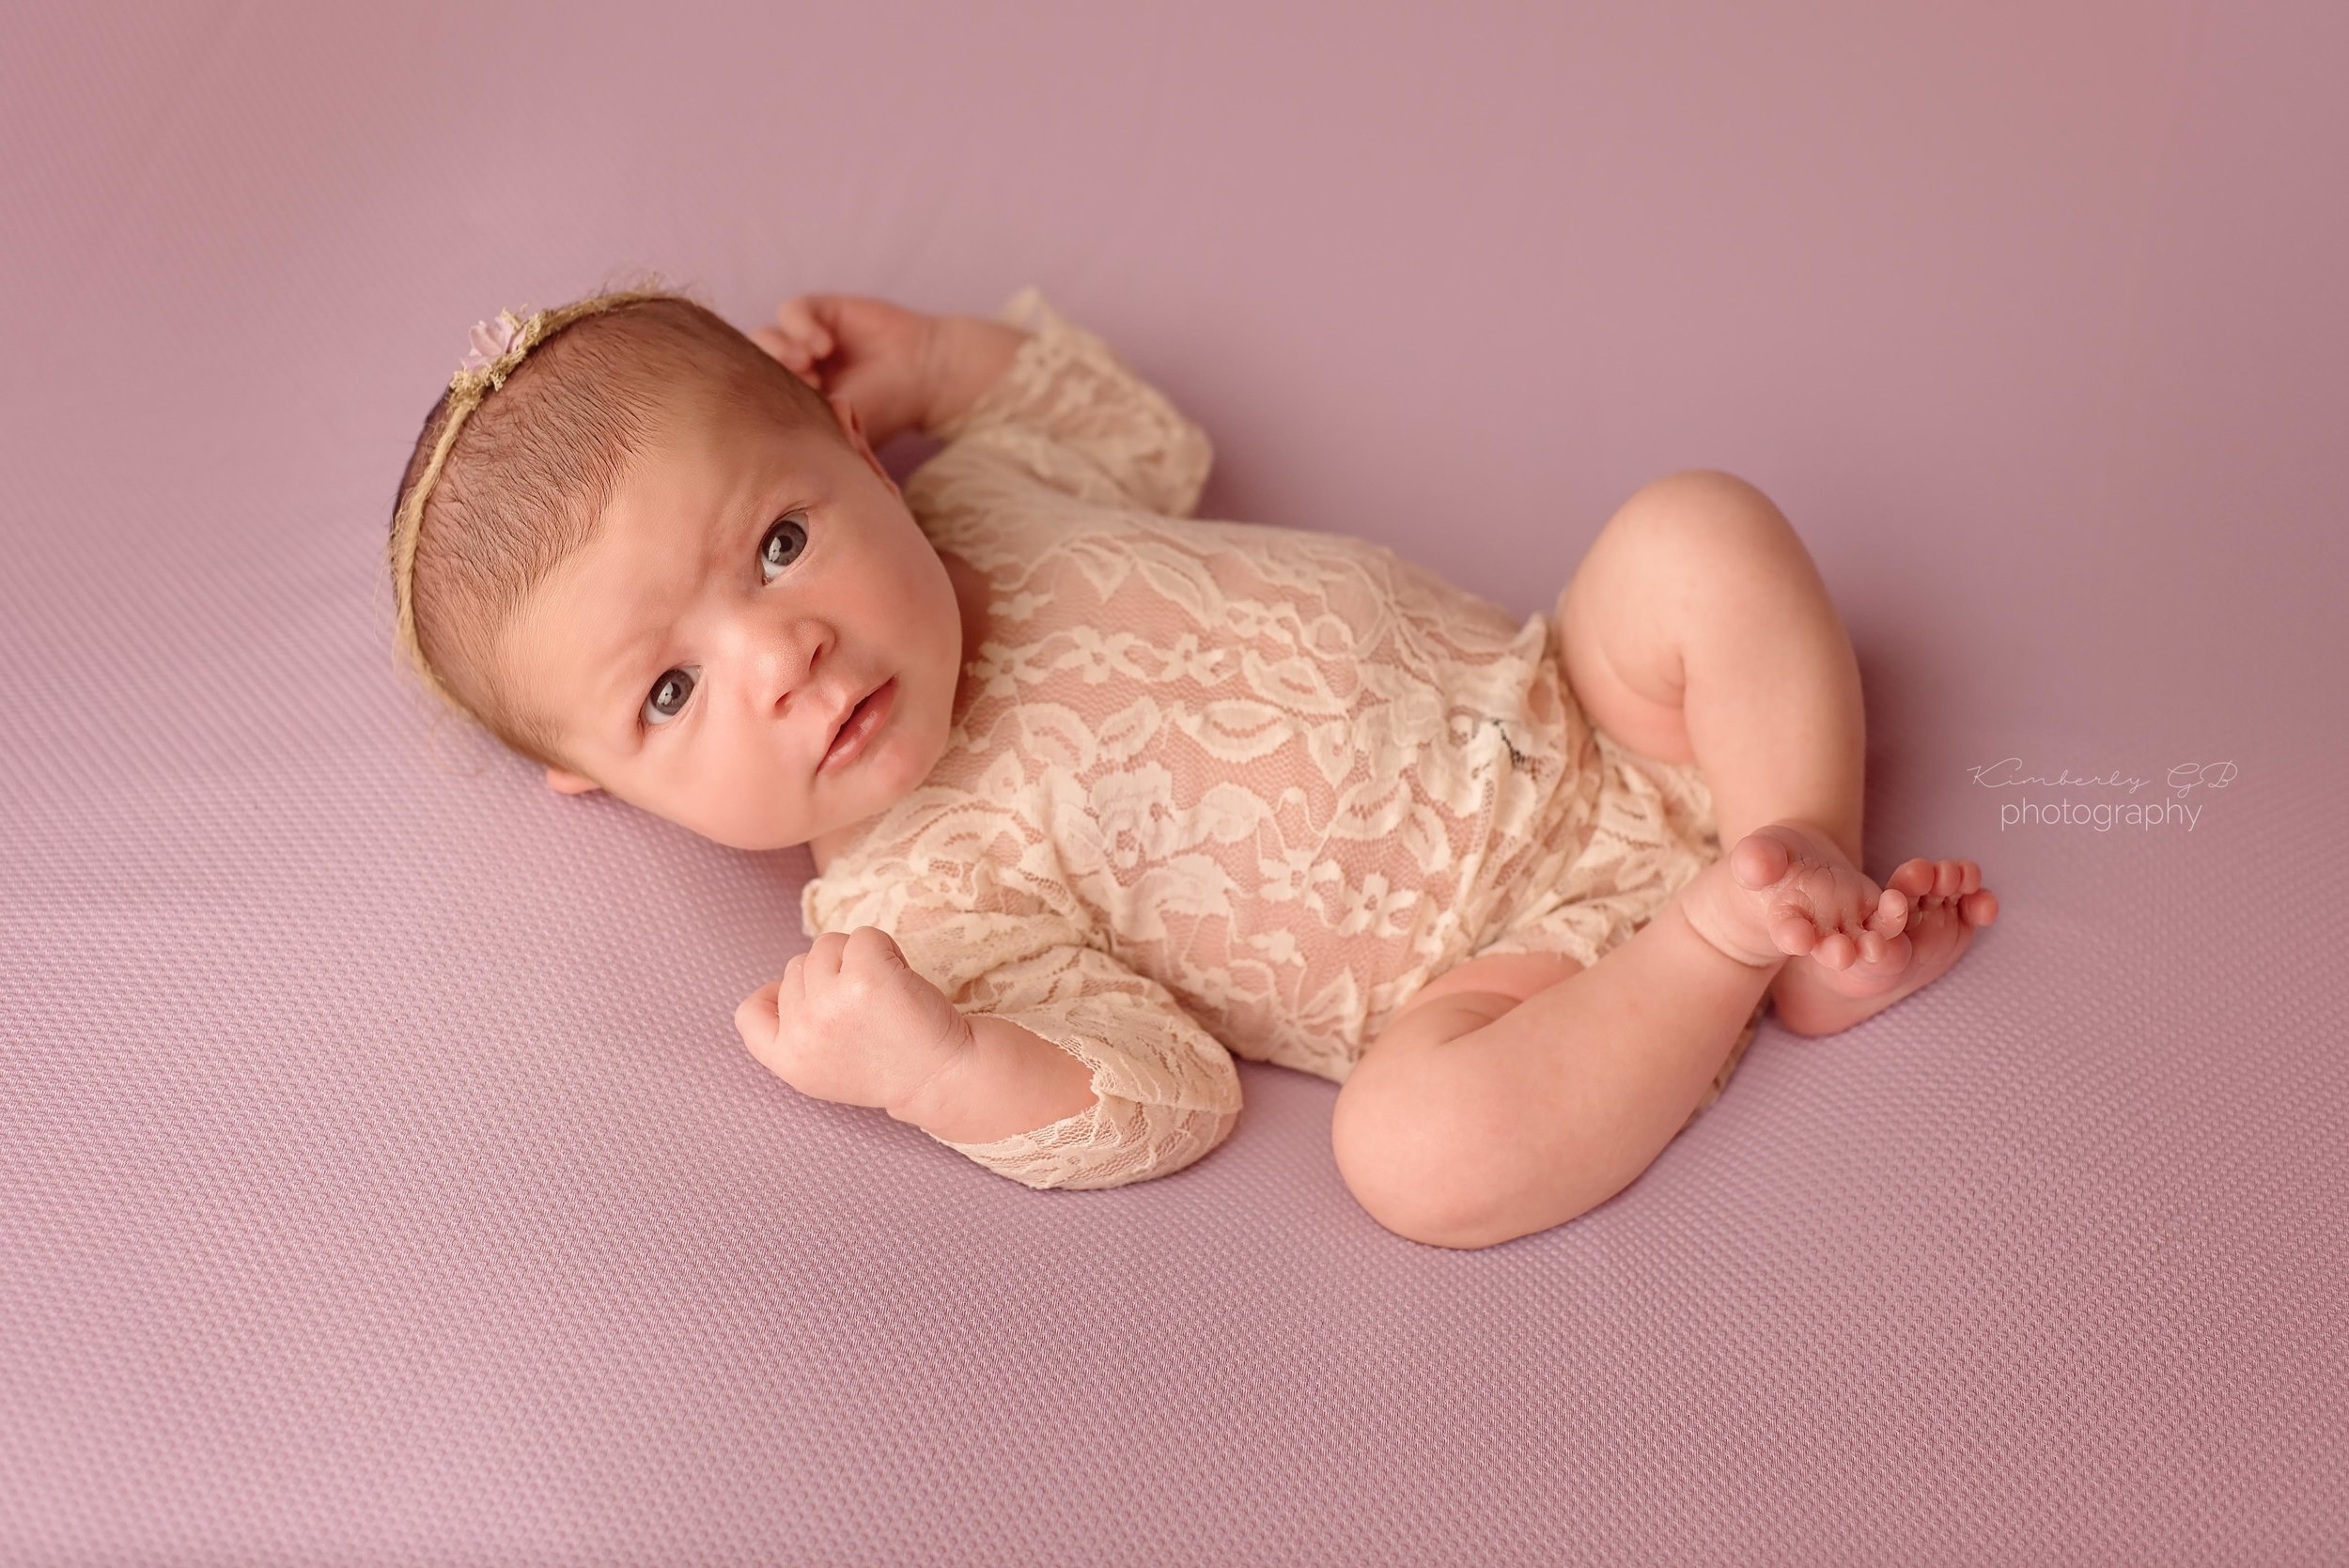 fotografia-de-recien-nacidos-bebes-newborn-en-puerto-rico-kimberly-gb-photography-fotografa-134.jpg